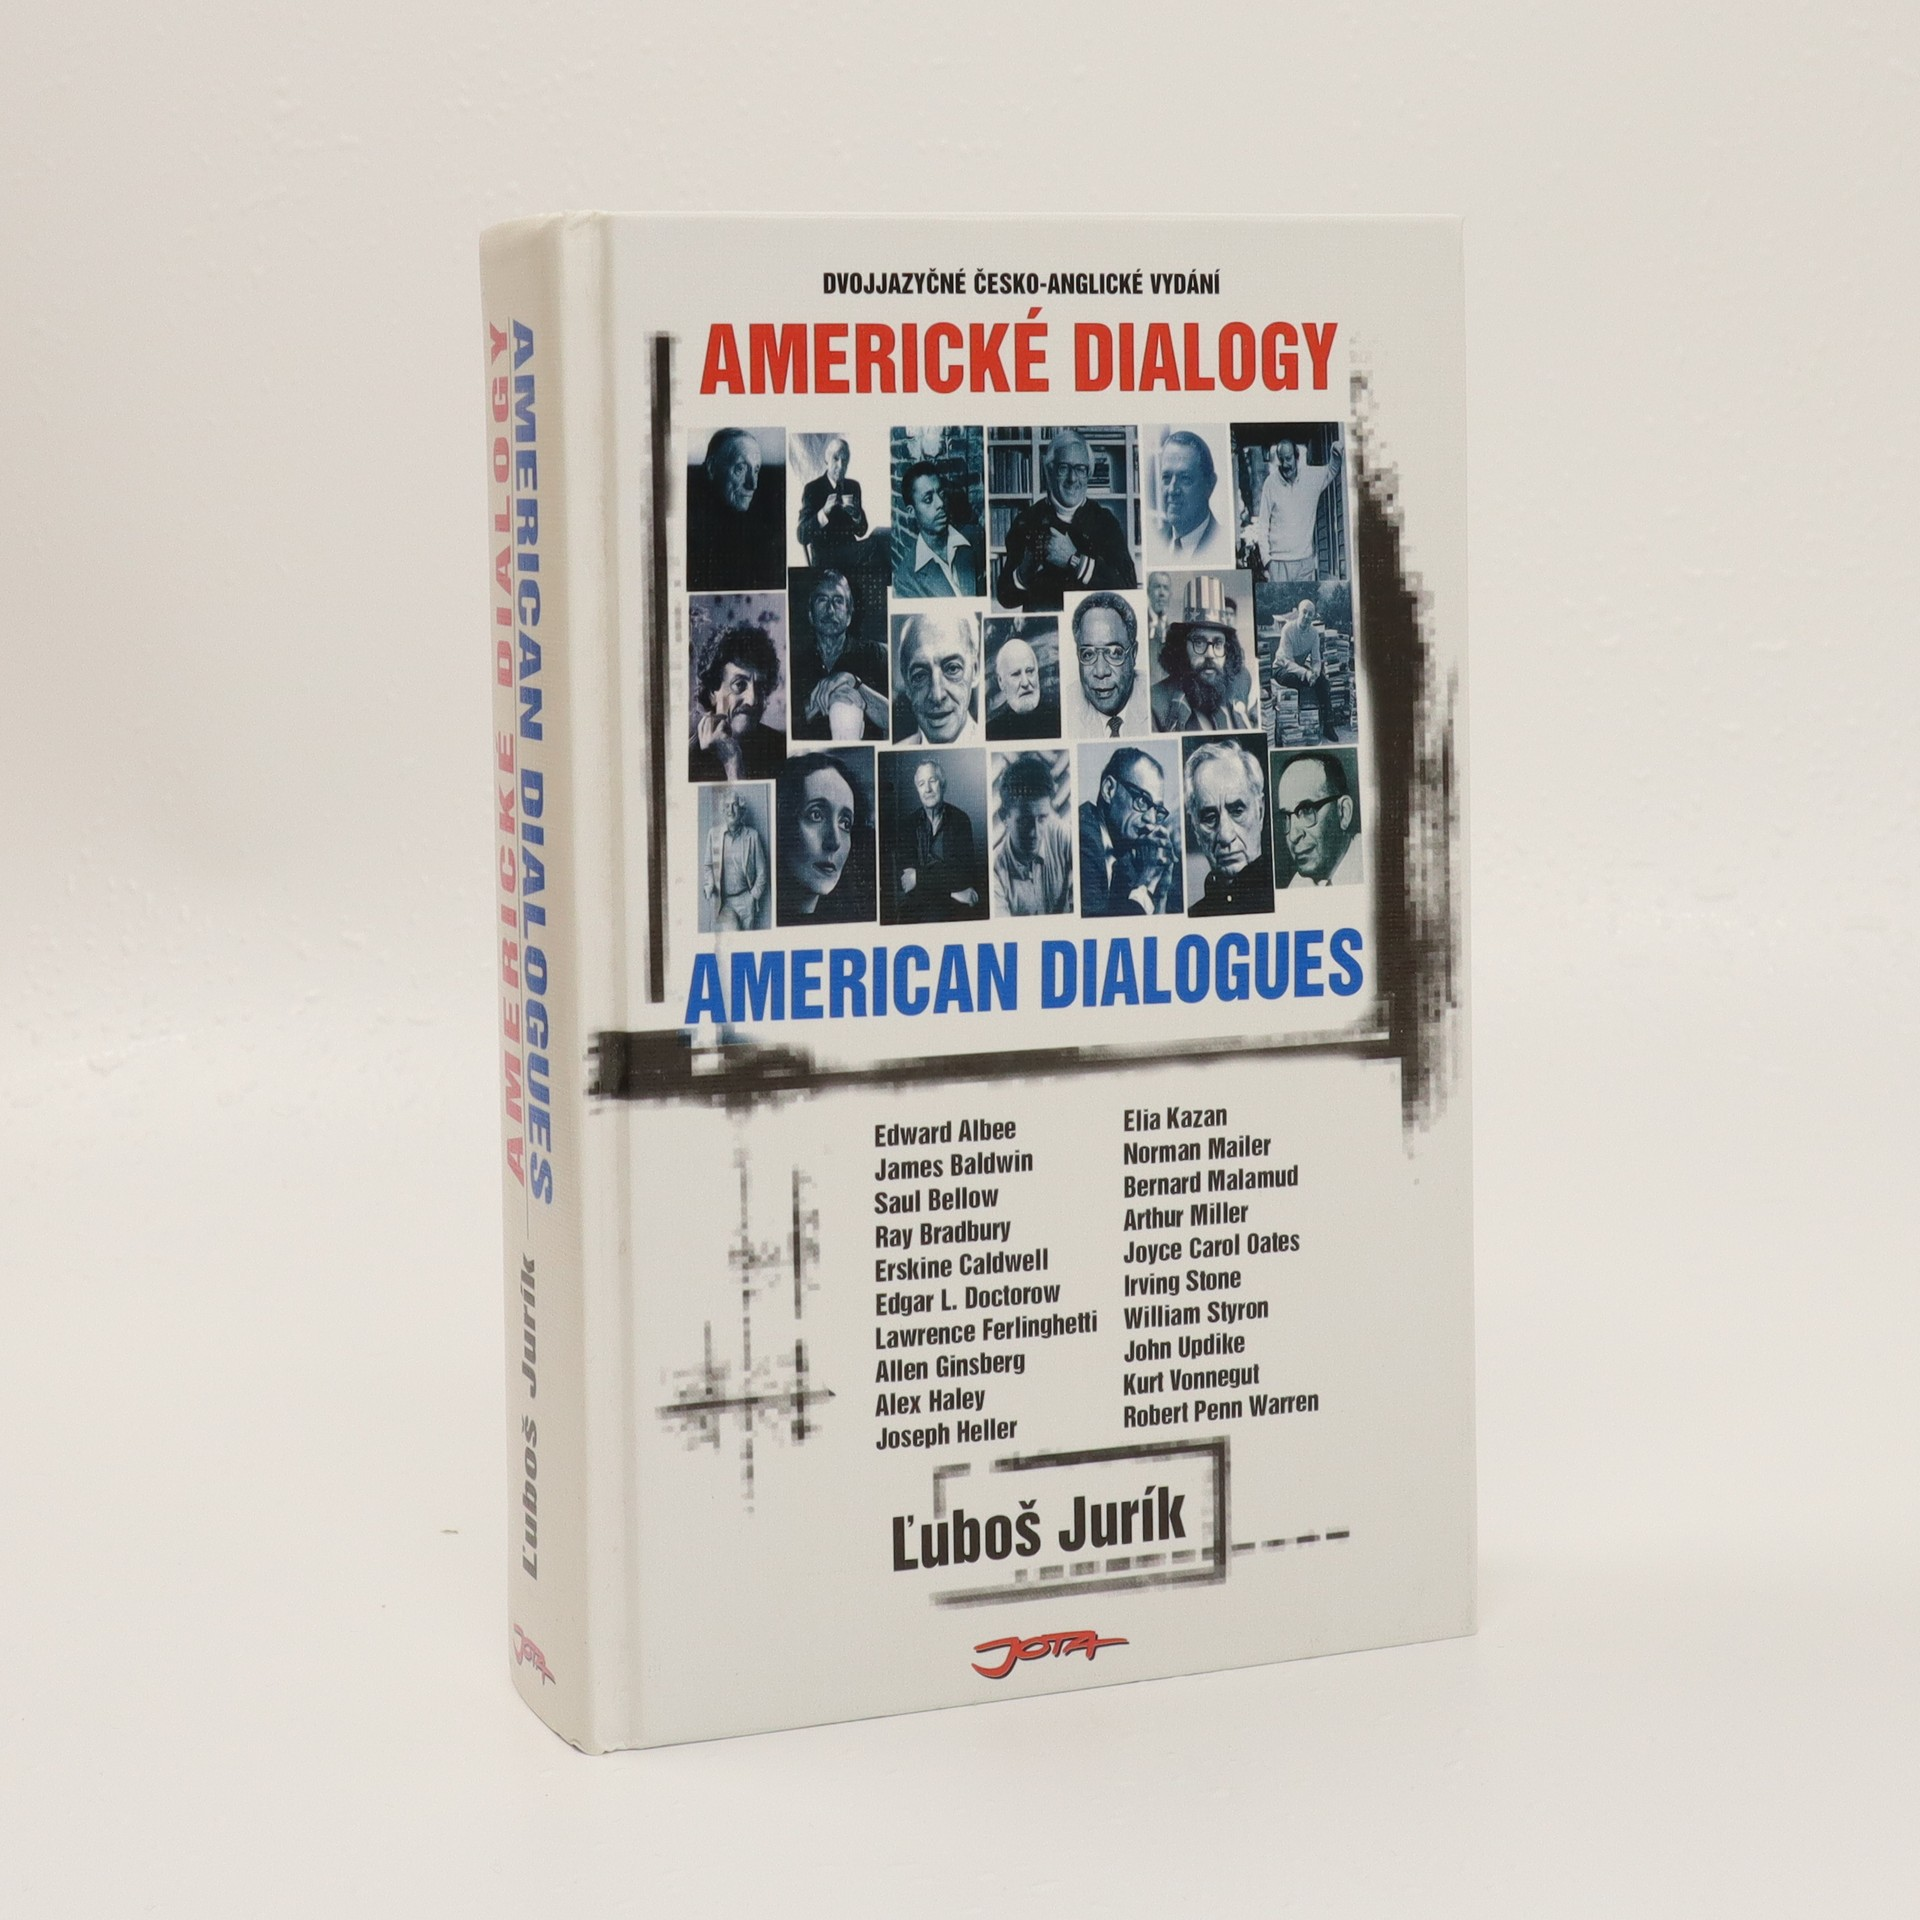 antikvární kniha Americké dialogy = American dialogues (dvojjazyčná), 2002